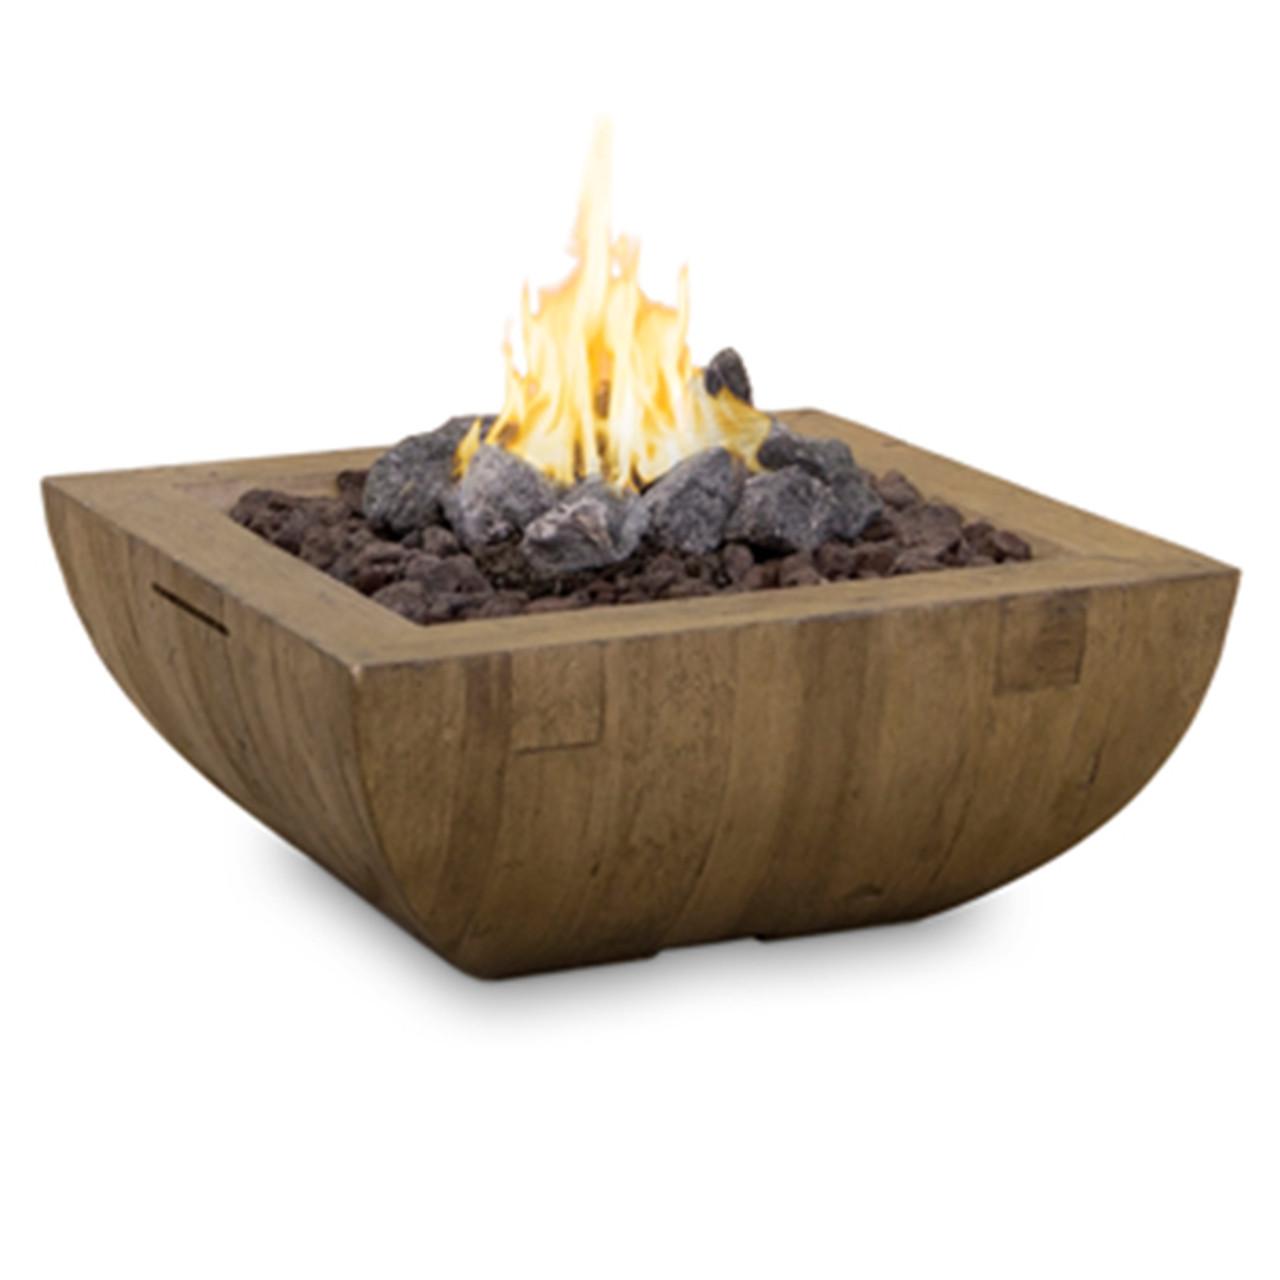 36 Bordeaux Square Reclaimed Wood Fire Bowl